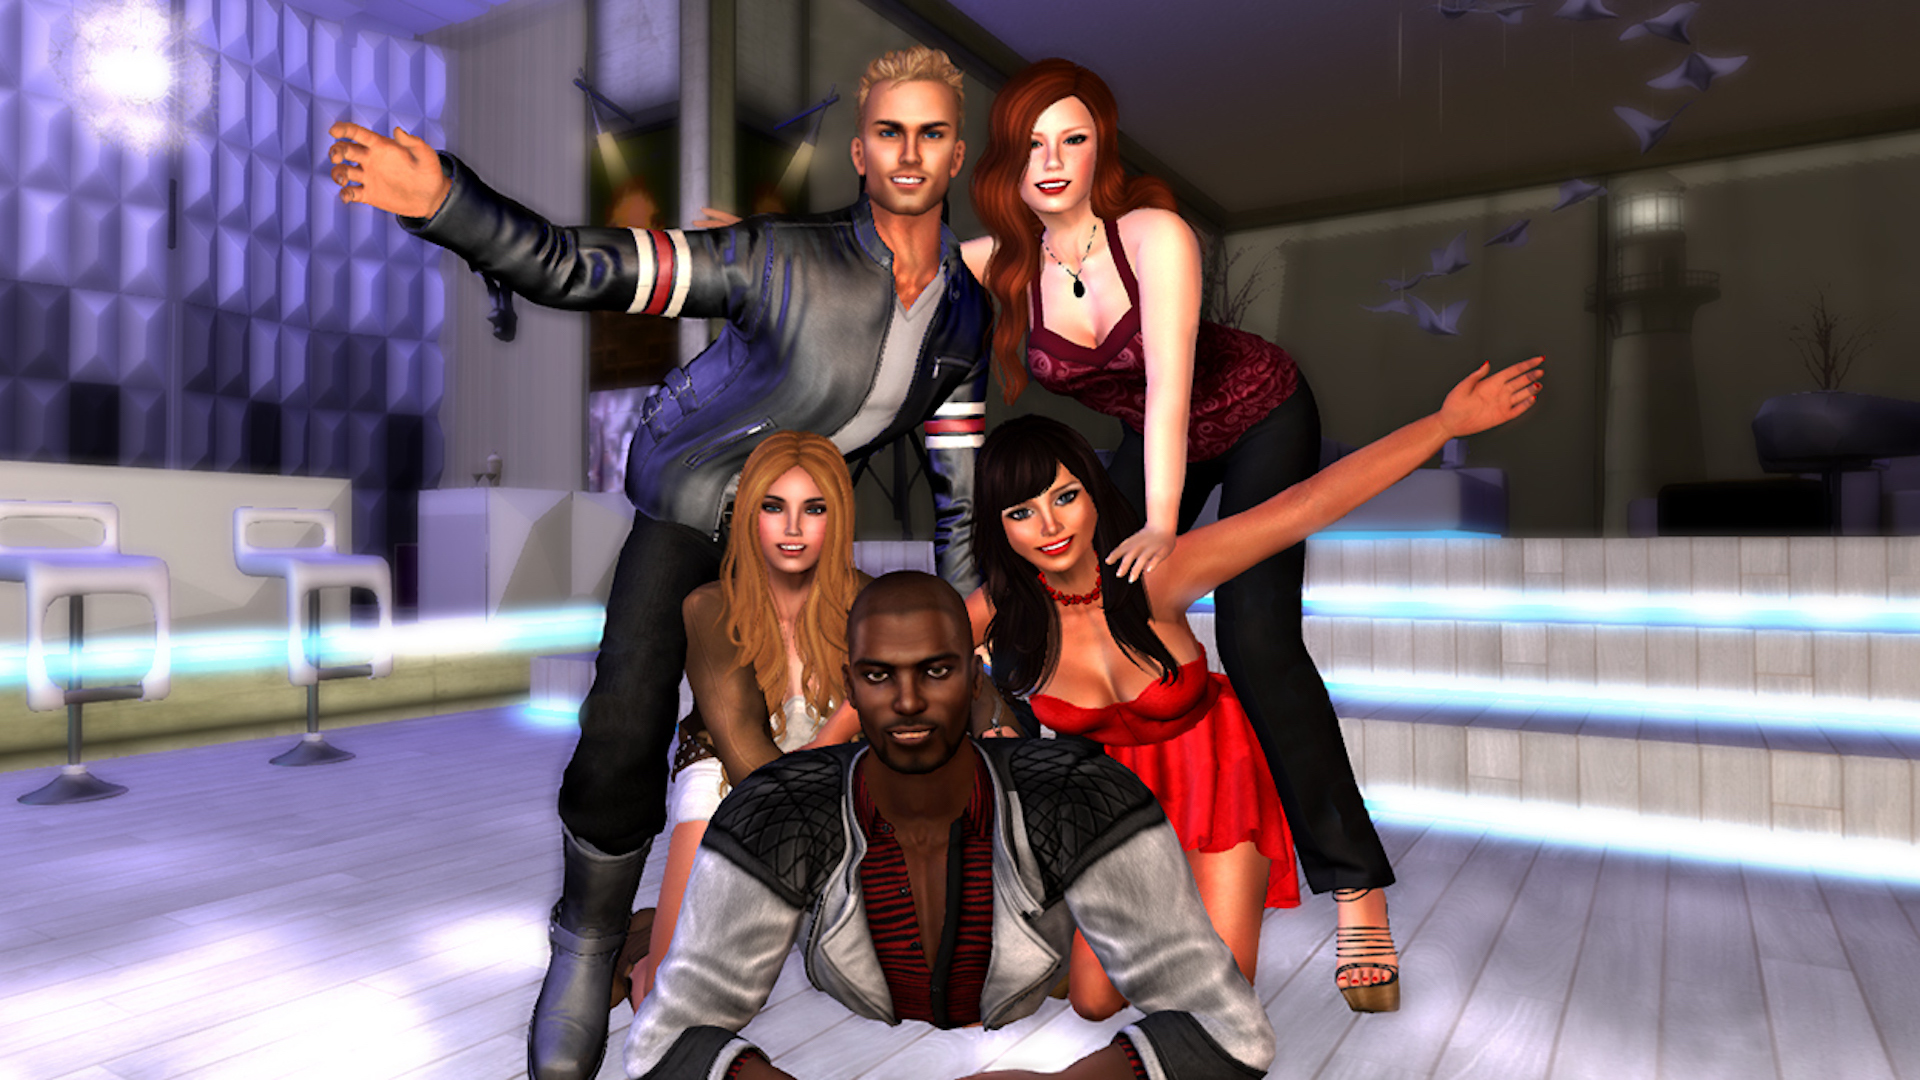 Second life avatars hard core sex